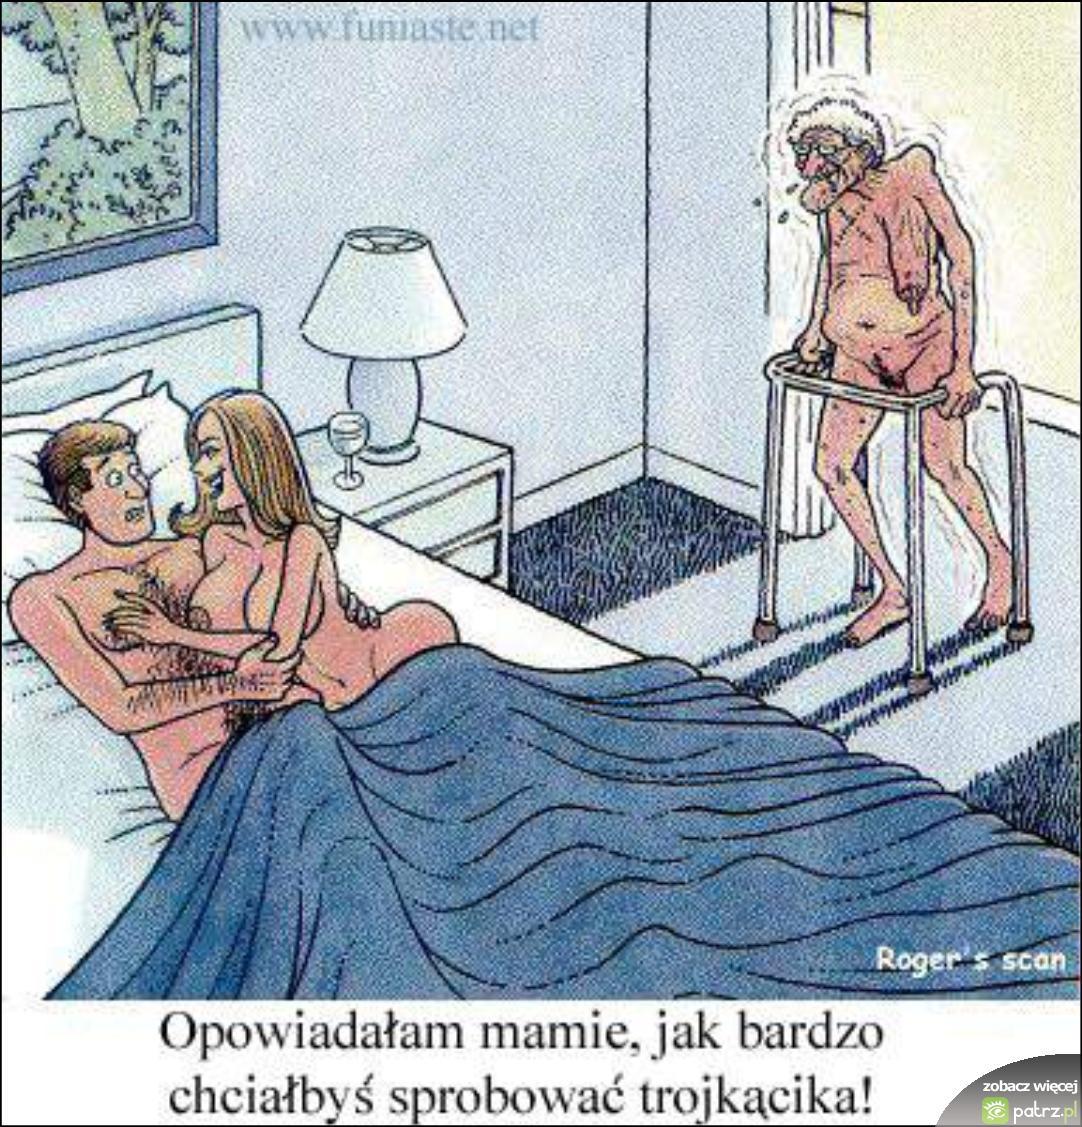 prikolnie-anekdoti-pro-seks